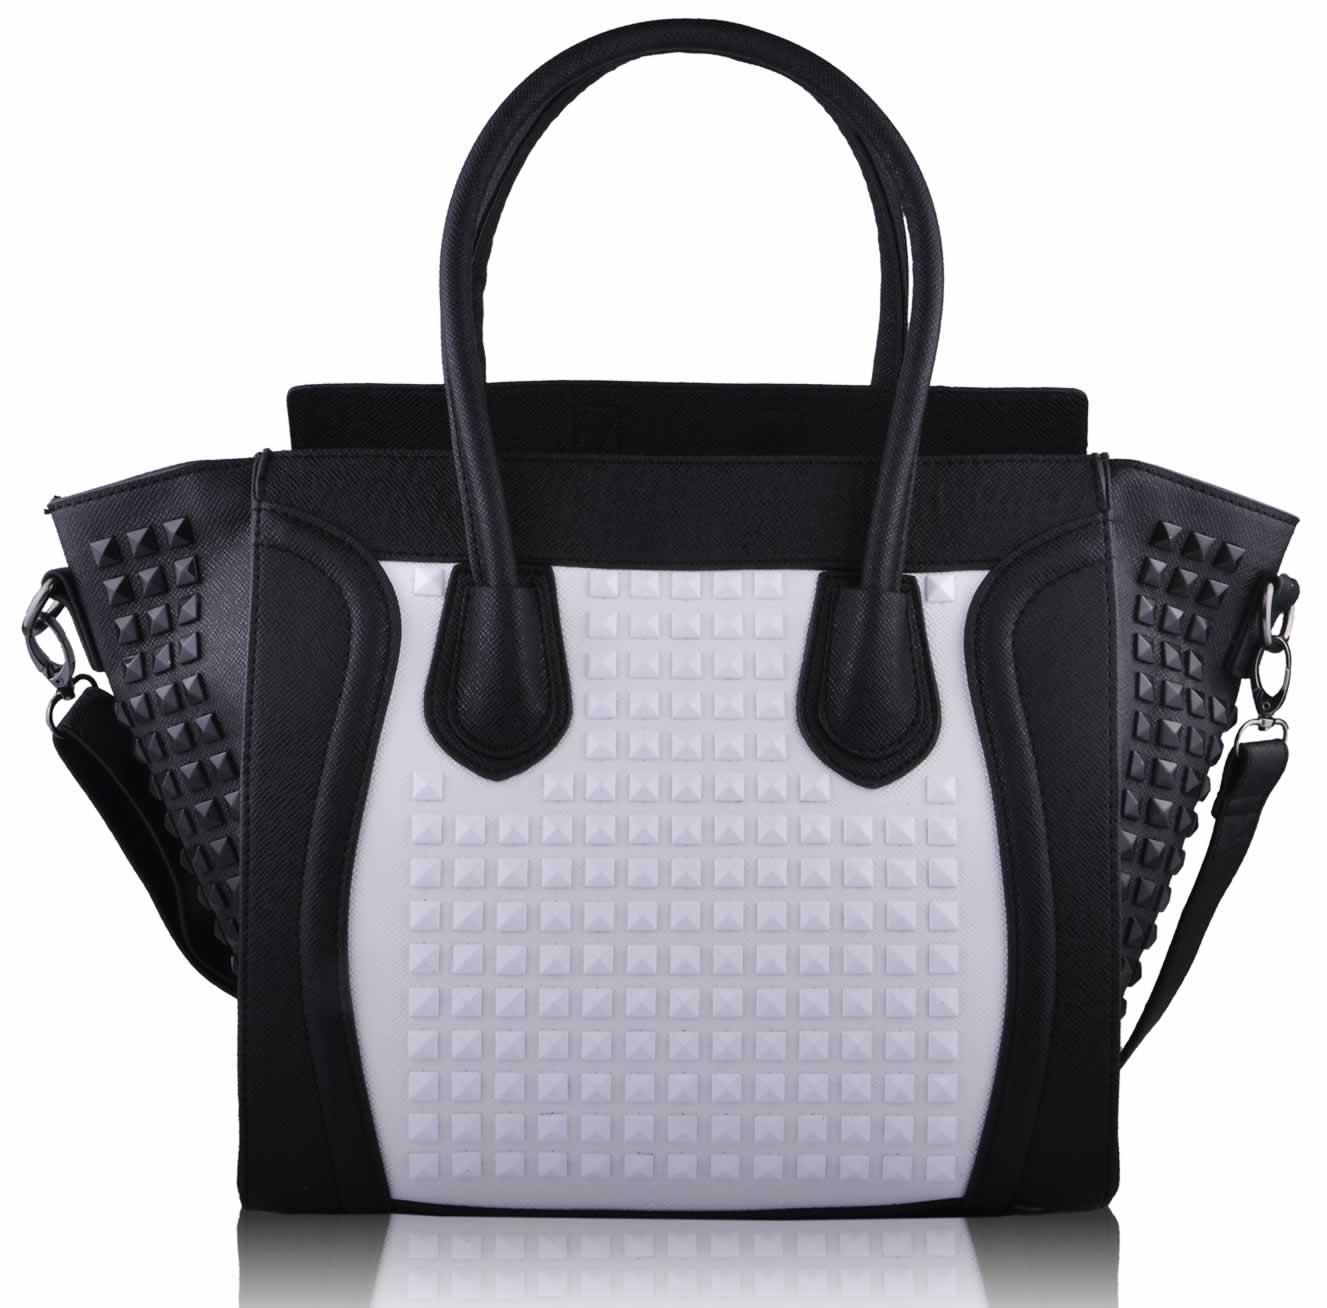 Wholesale Black / White Tote Handbag